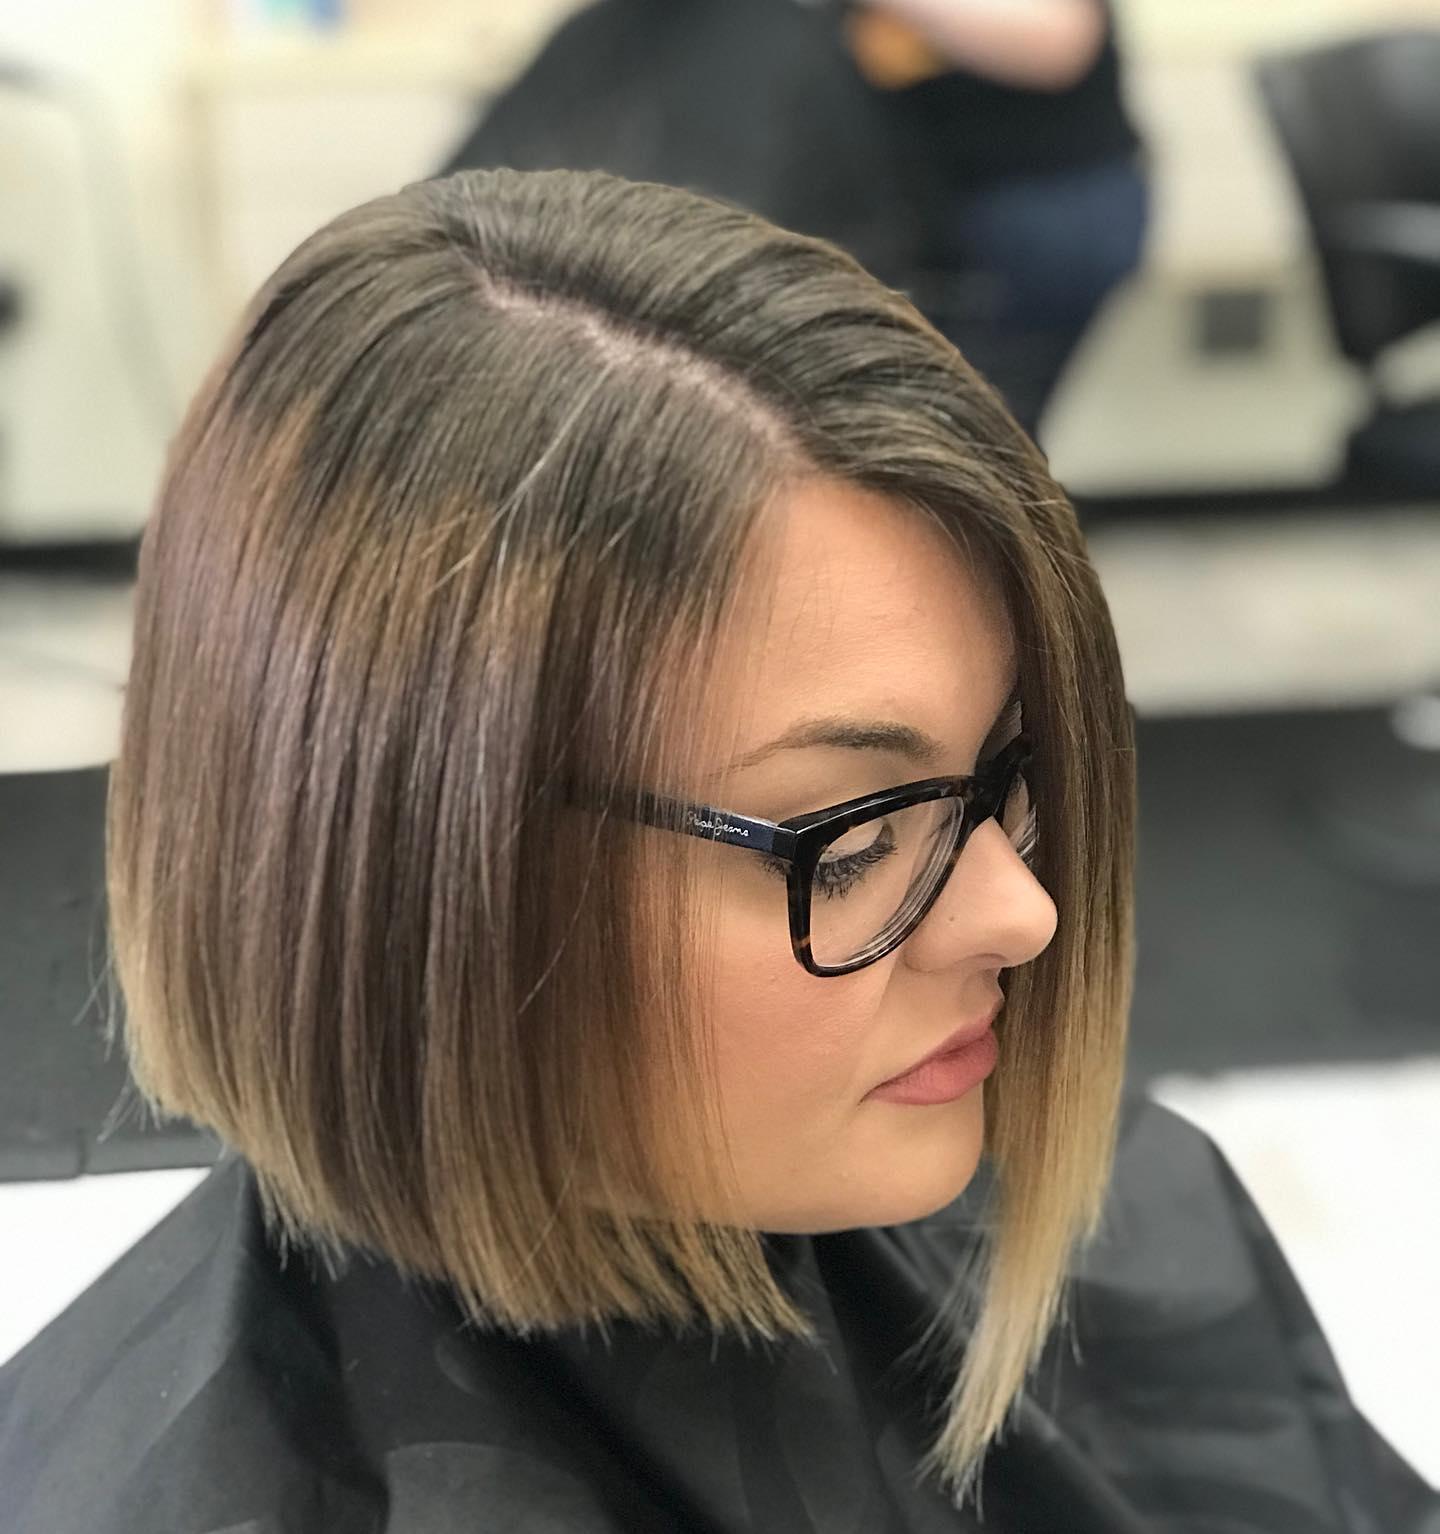 Best Short Hair Cuts For Women The Official Blog Of Hair Cuttery